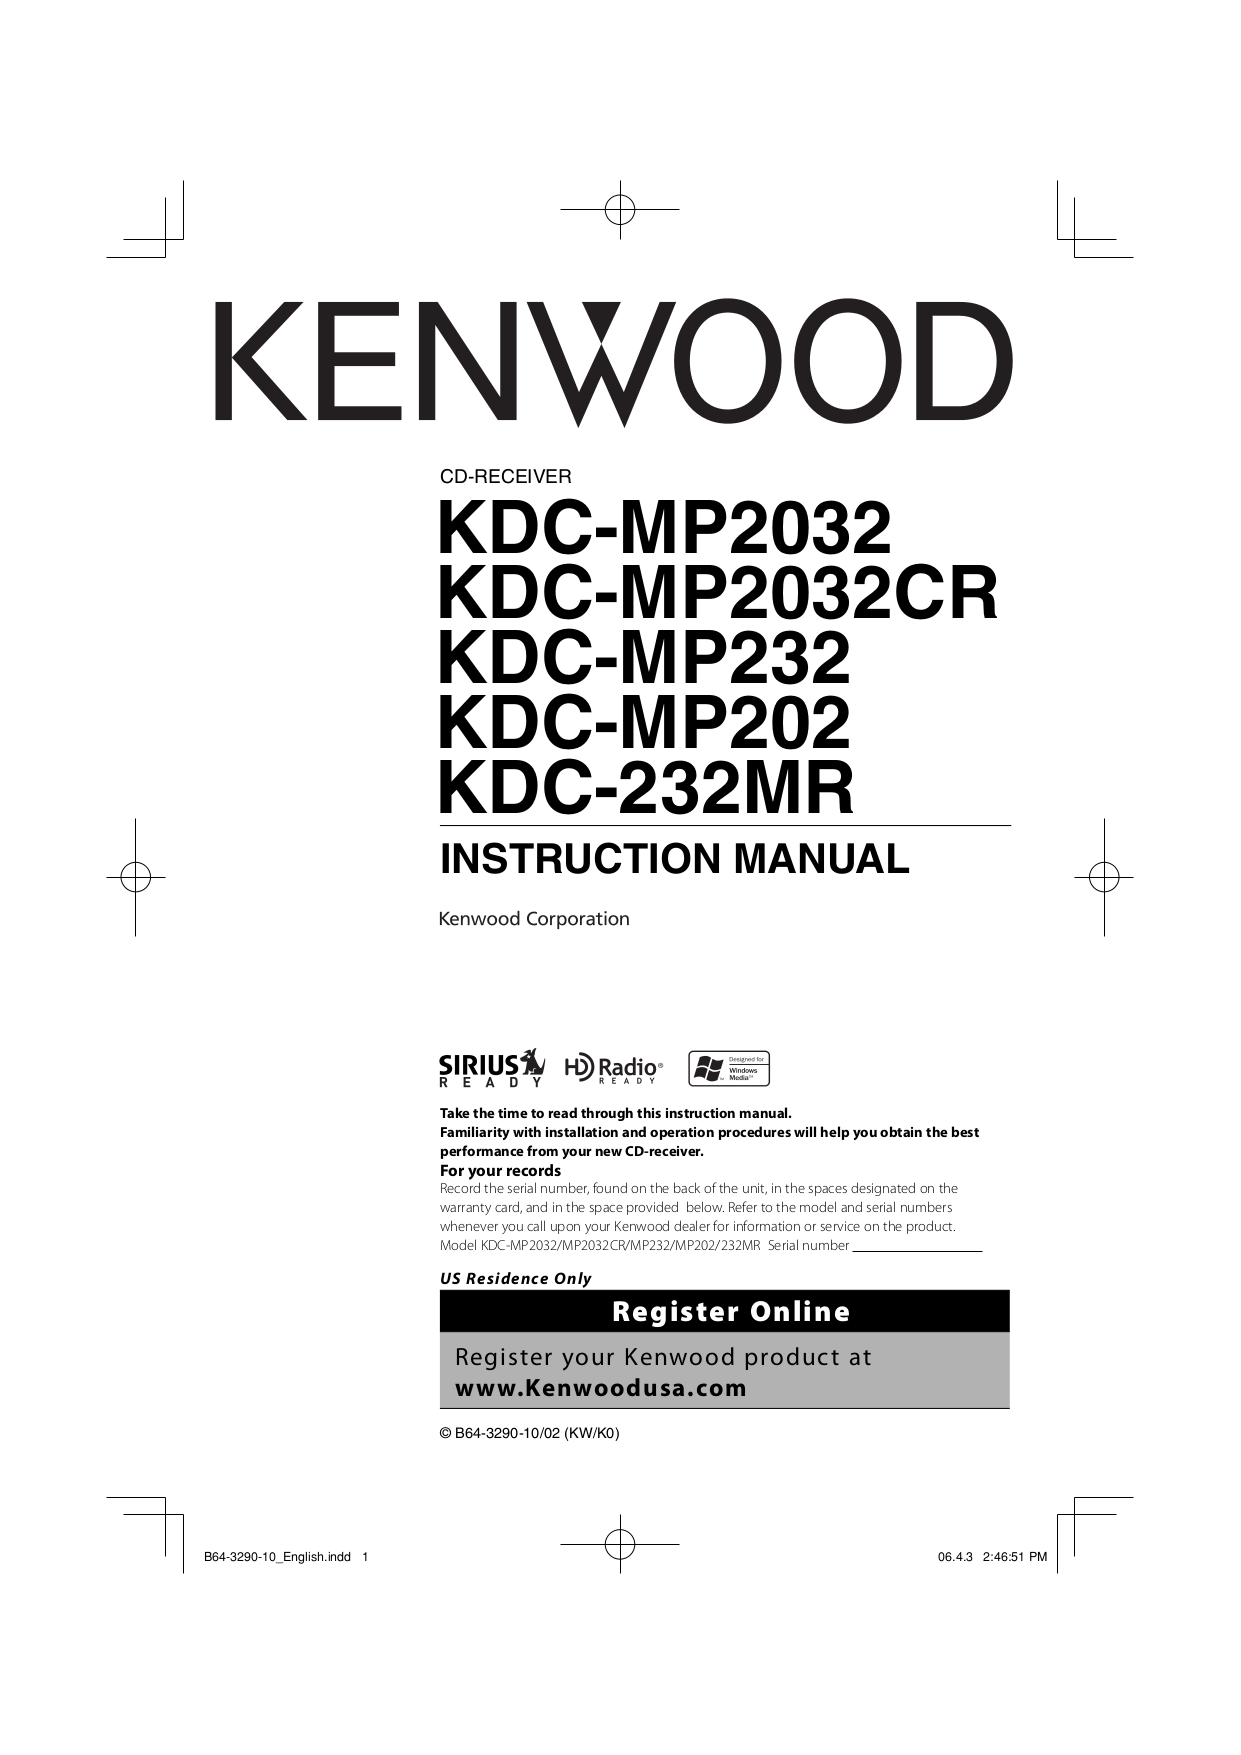 free car manuals in pdf format